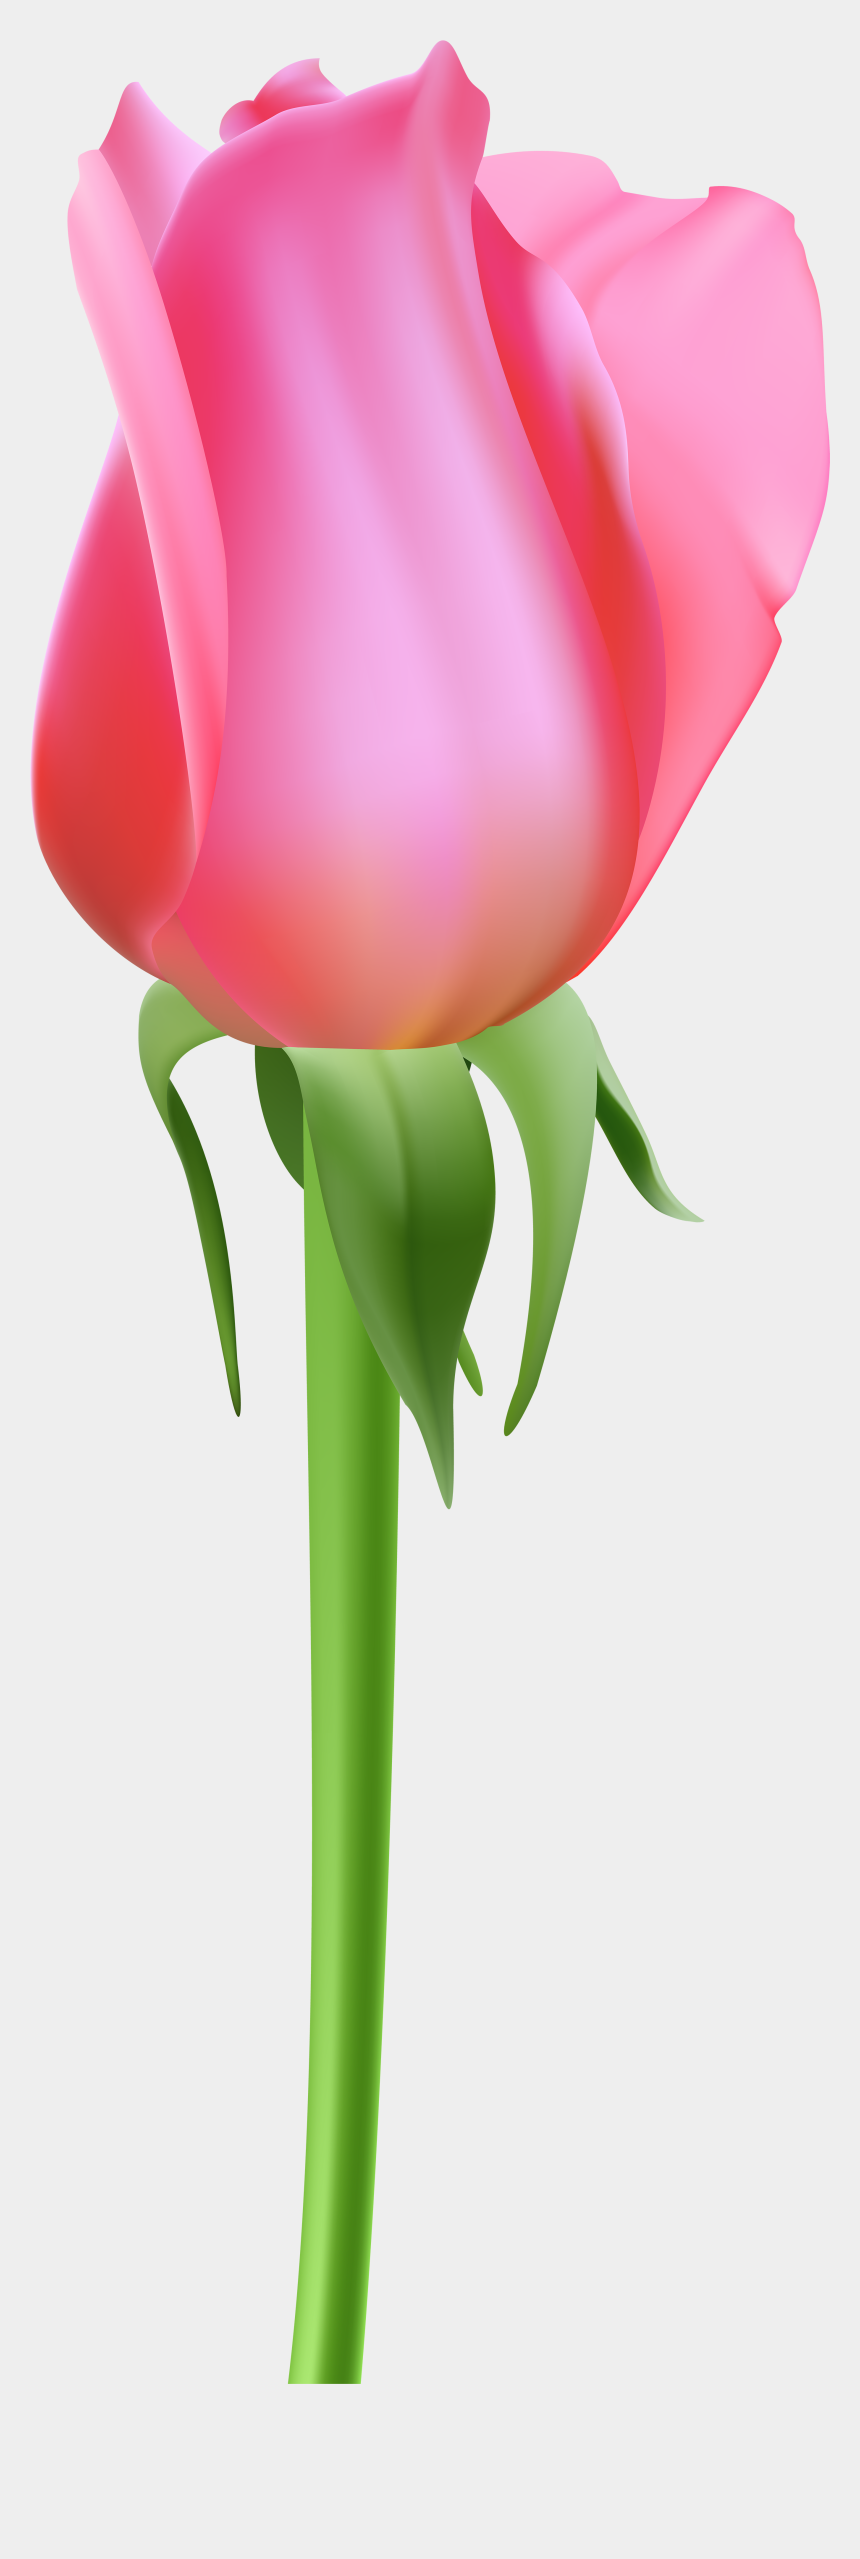 rose bud clipart, Cartoons - Rose Bud Pink Transparent Clip Art - Portable Network Graphics